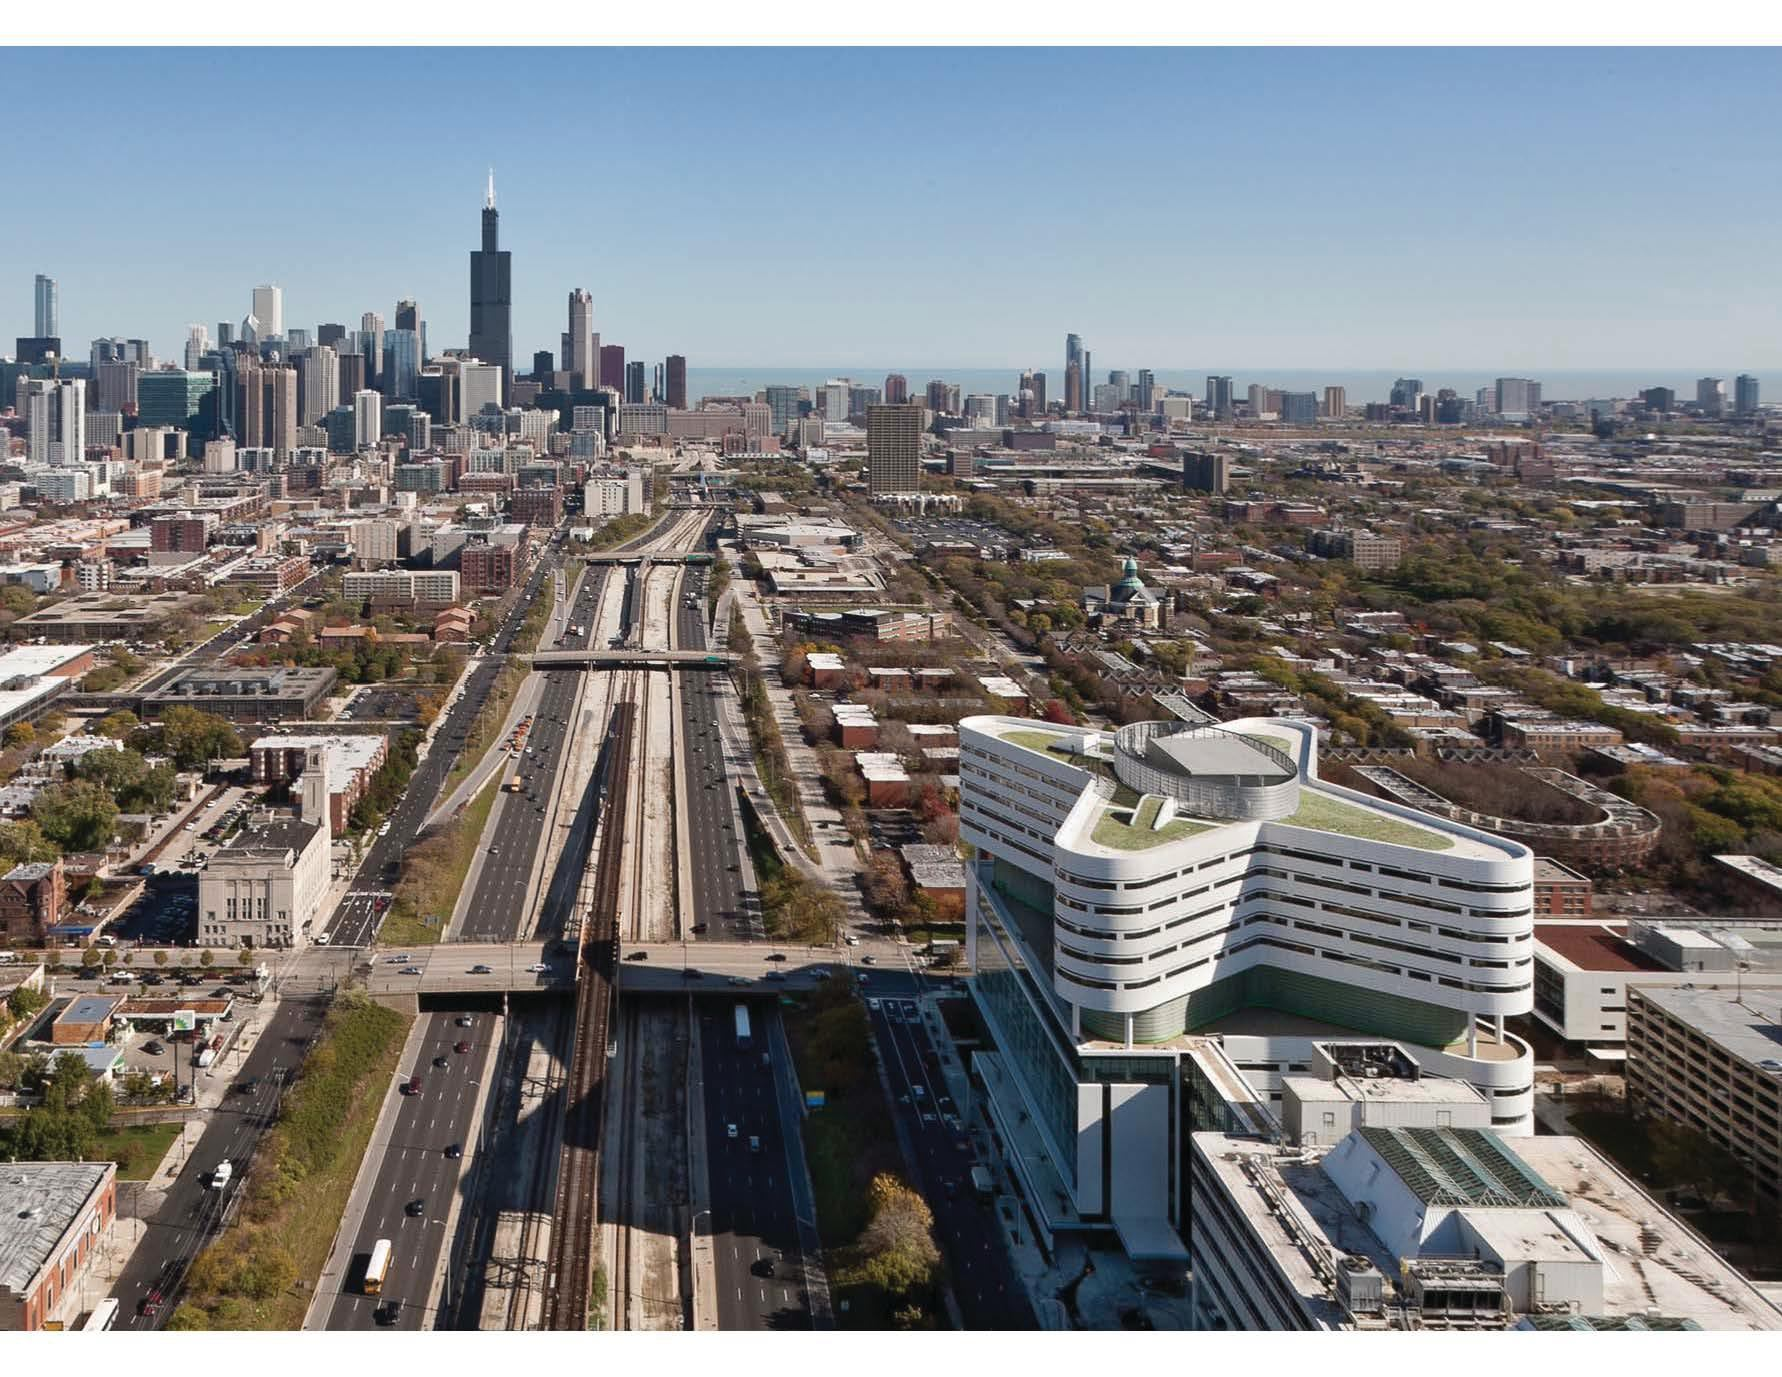 Illinois will county university park - Rush University Medical Center